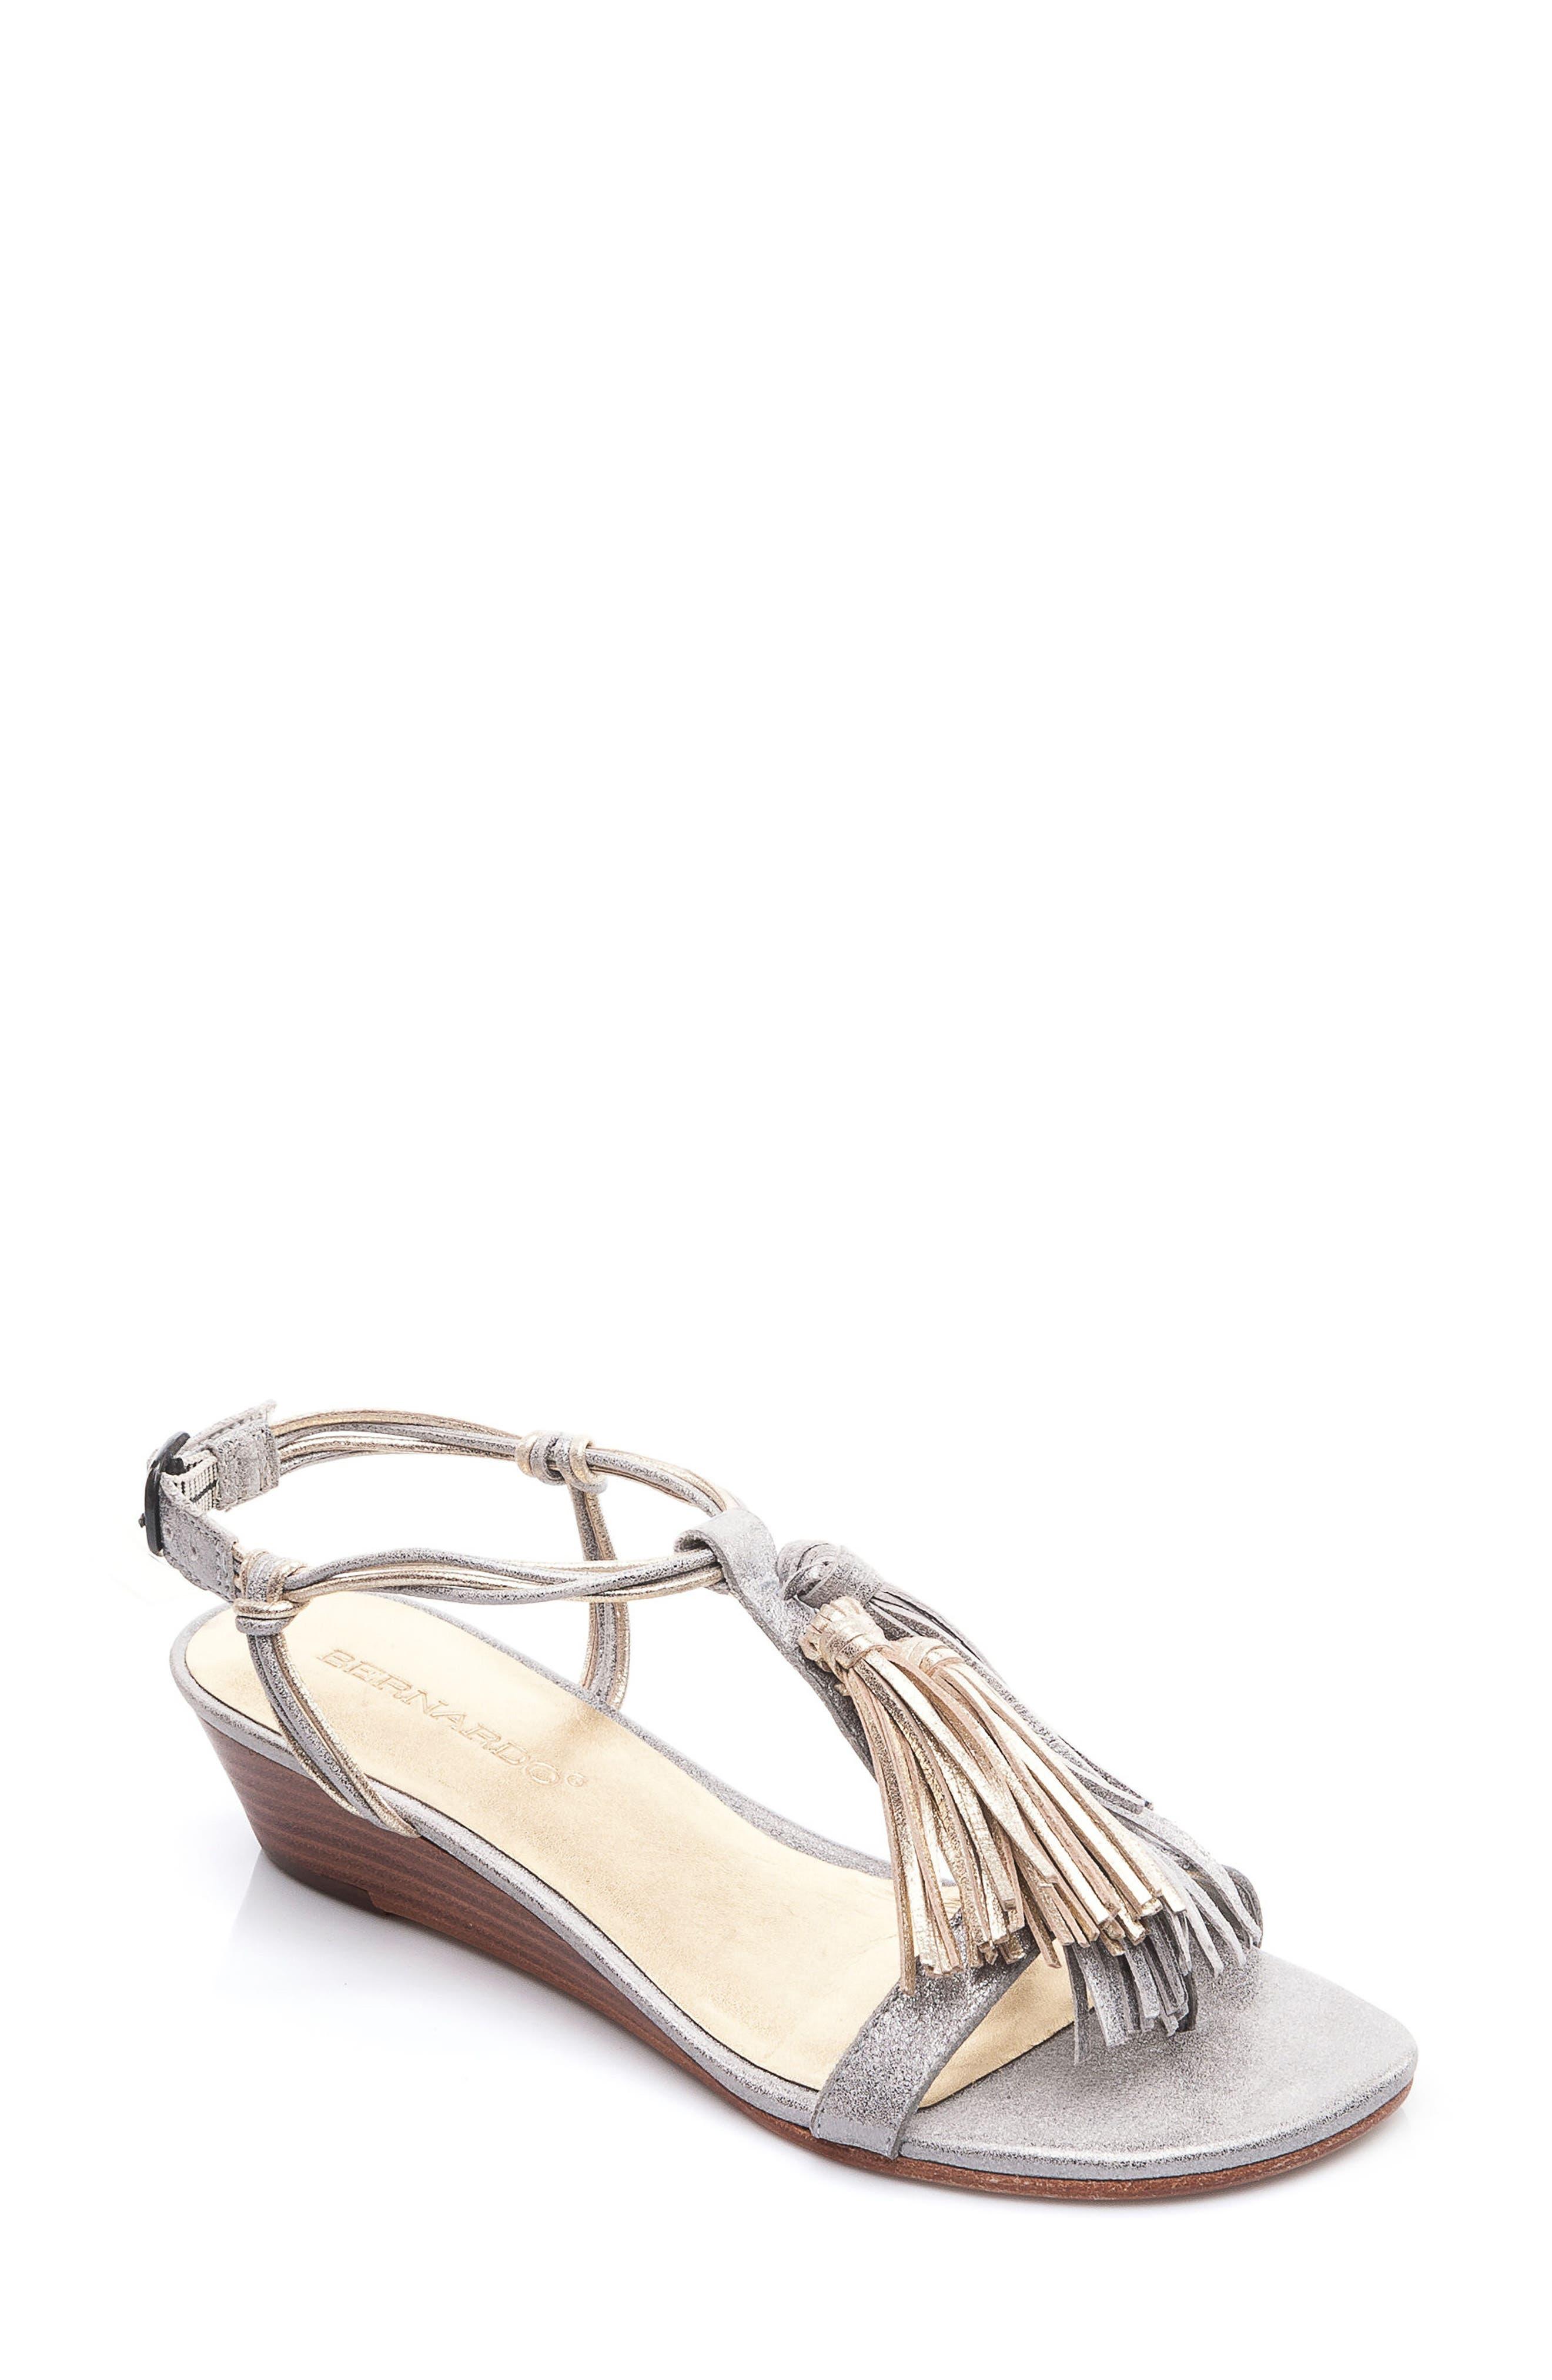 Footwear Court Fringe Leather Sandal,                             Main thumbnail 2, color,